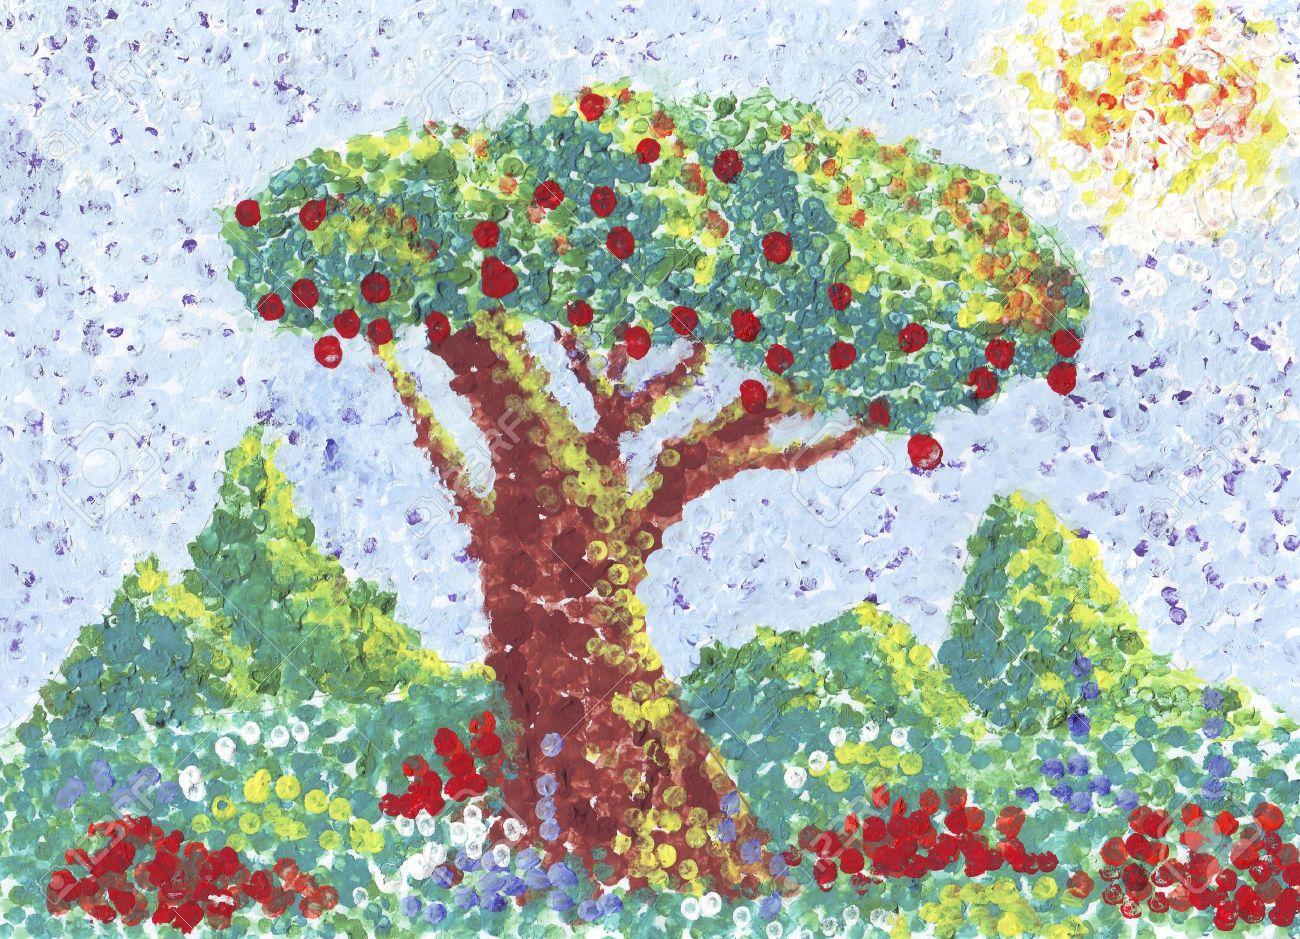 Apple Tree Painting In Pointilism Style Banco De Imagens Royalty Free Ilustracoes Imagens E Banco De Imagens Image 6184914